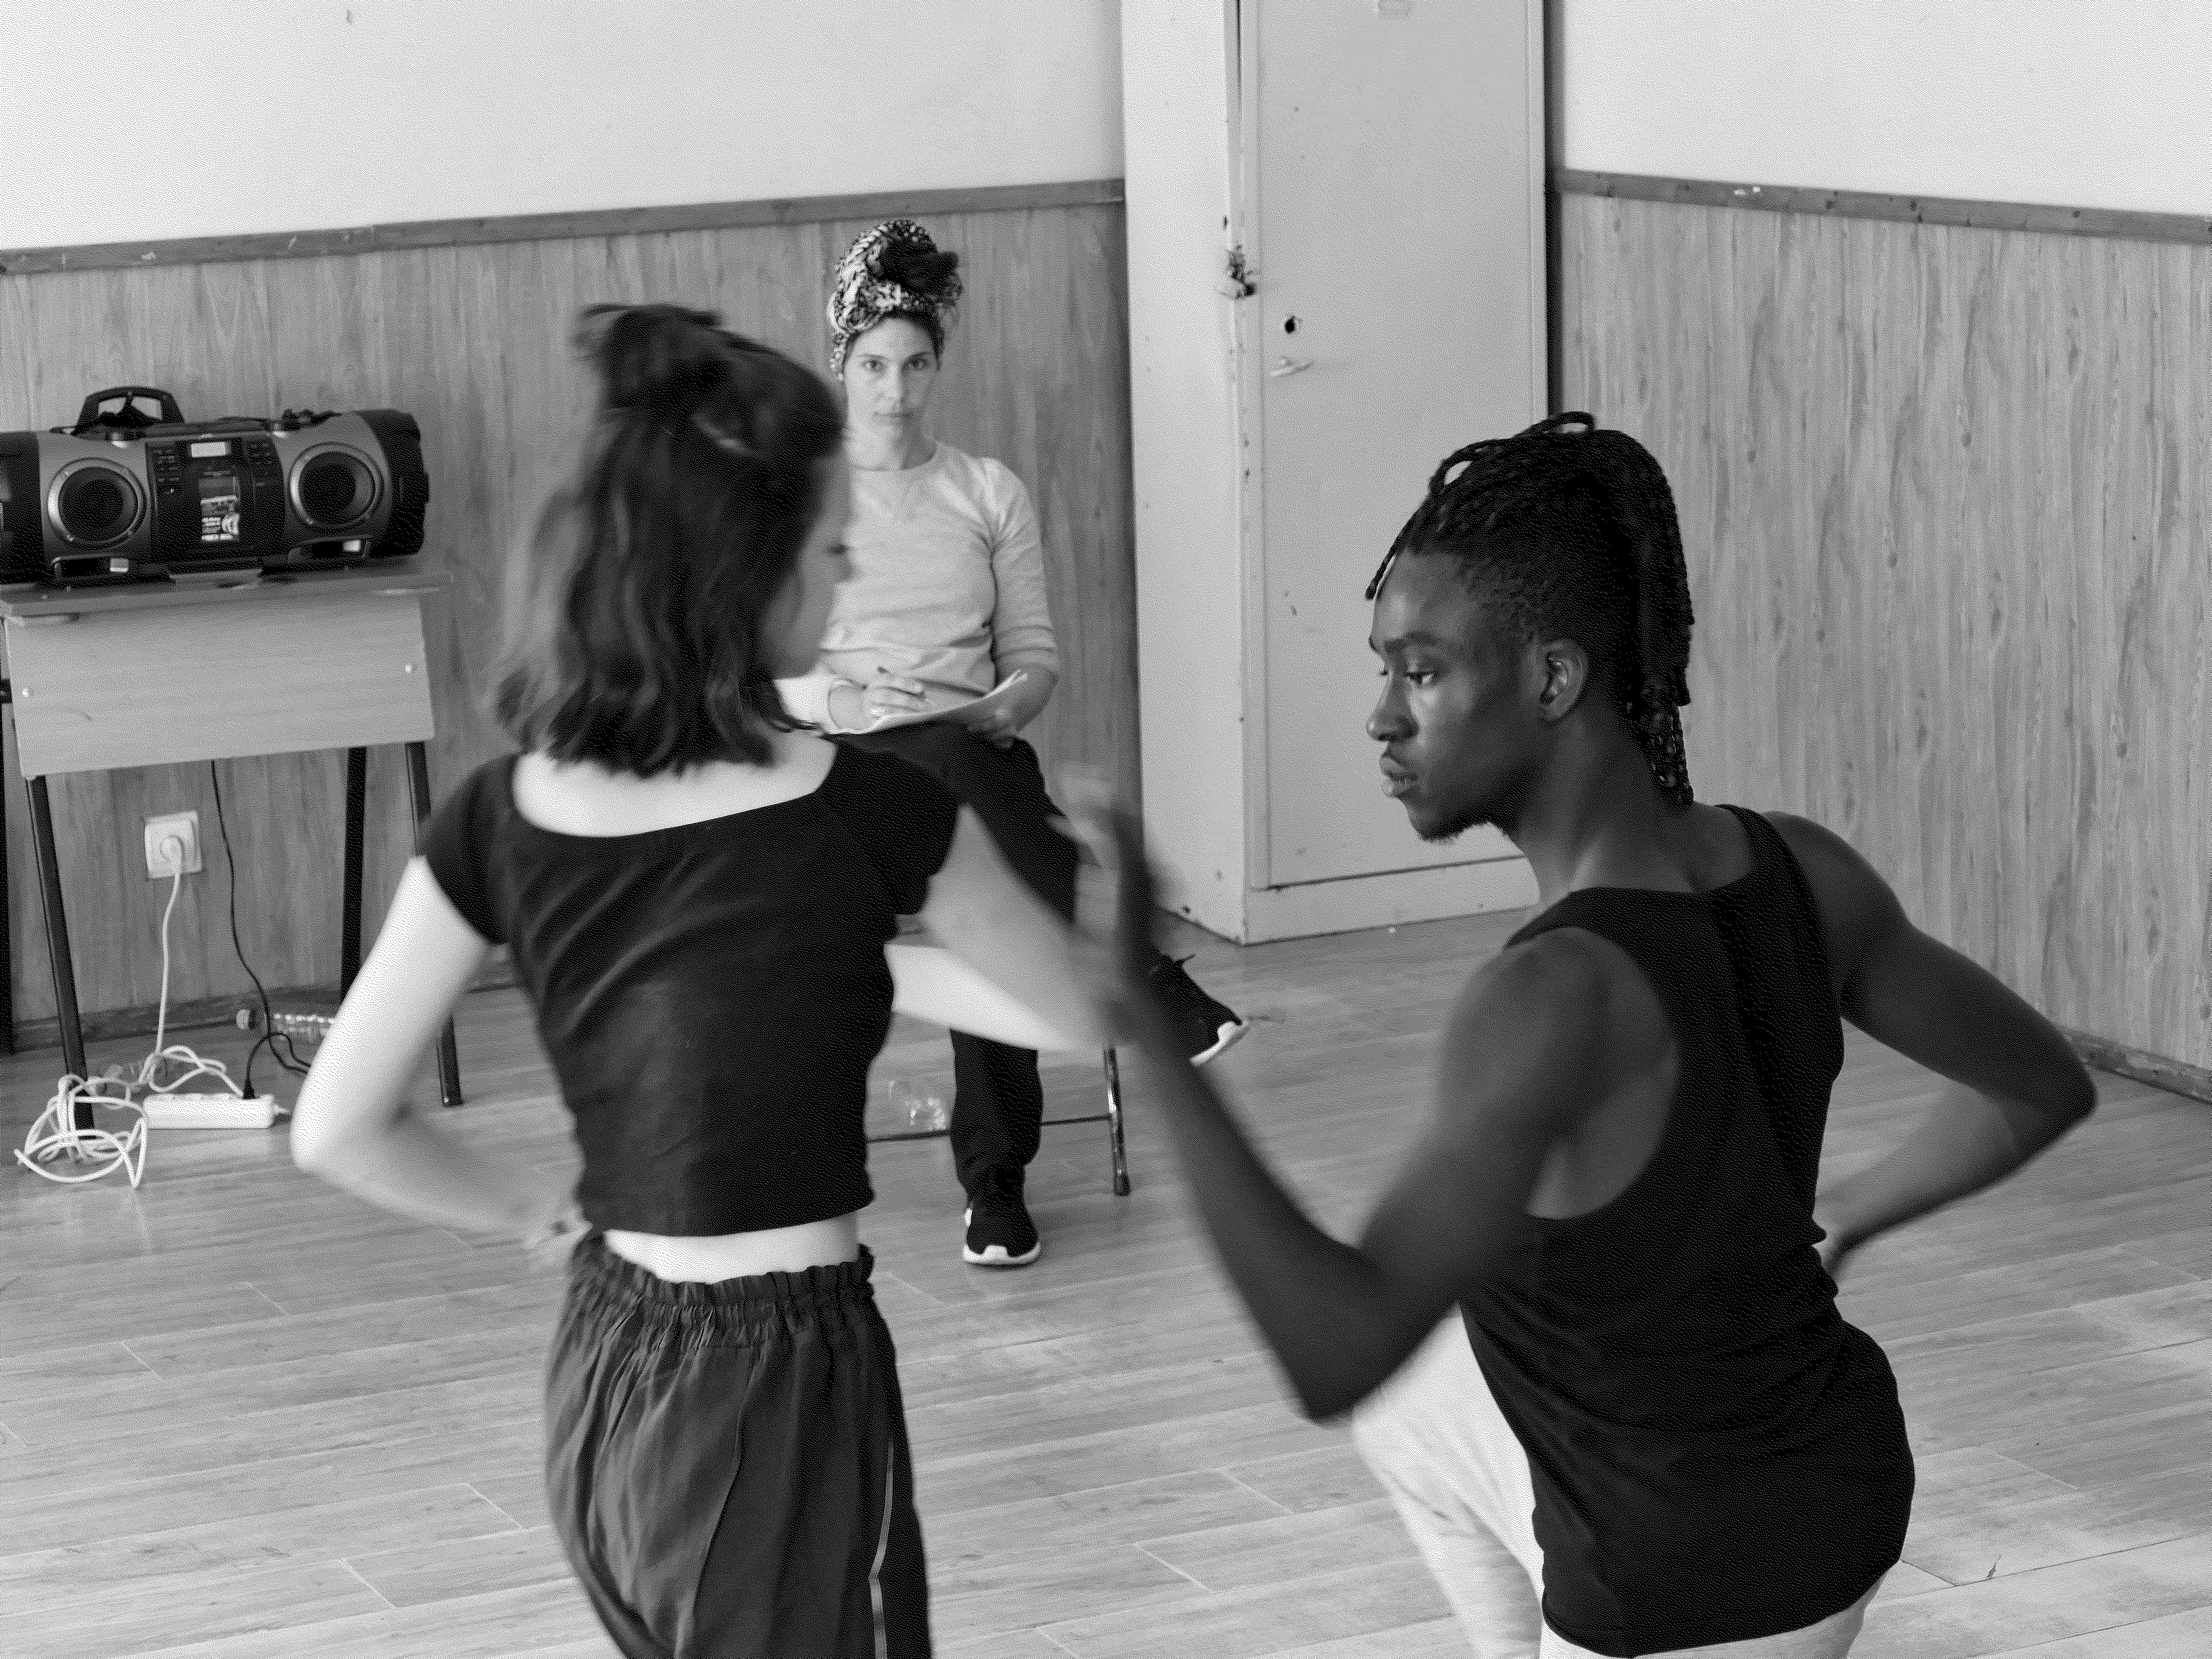 P1020785